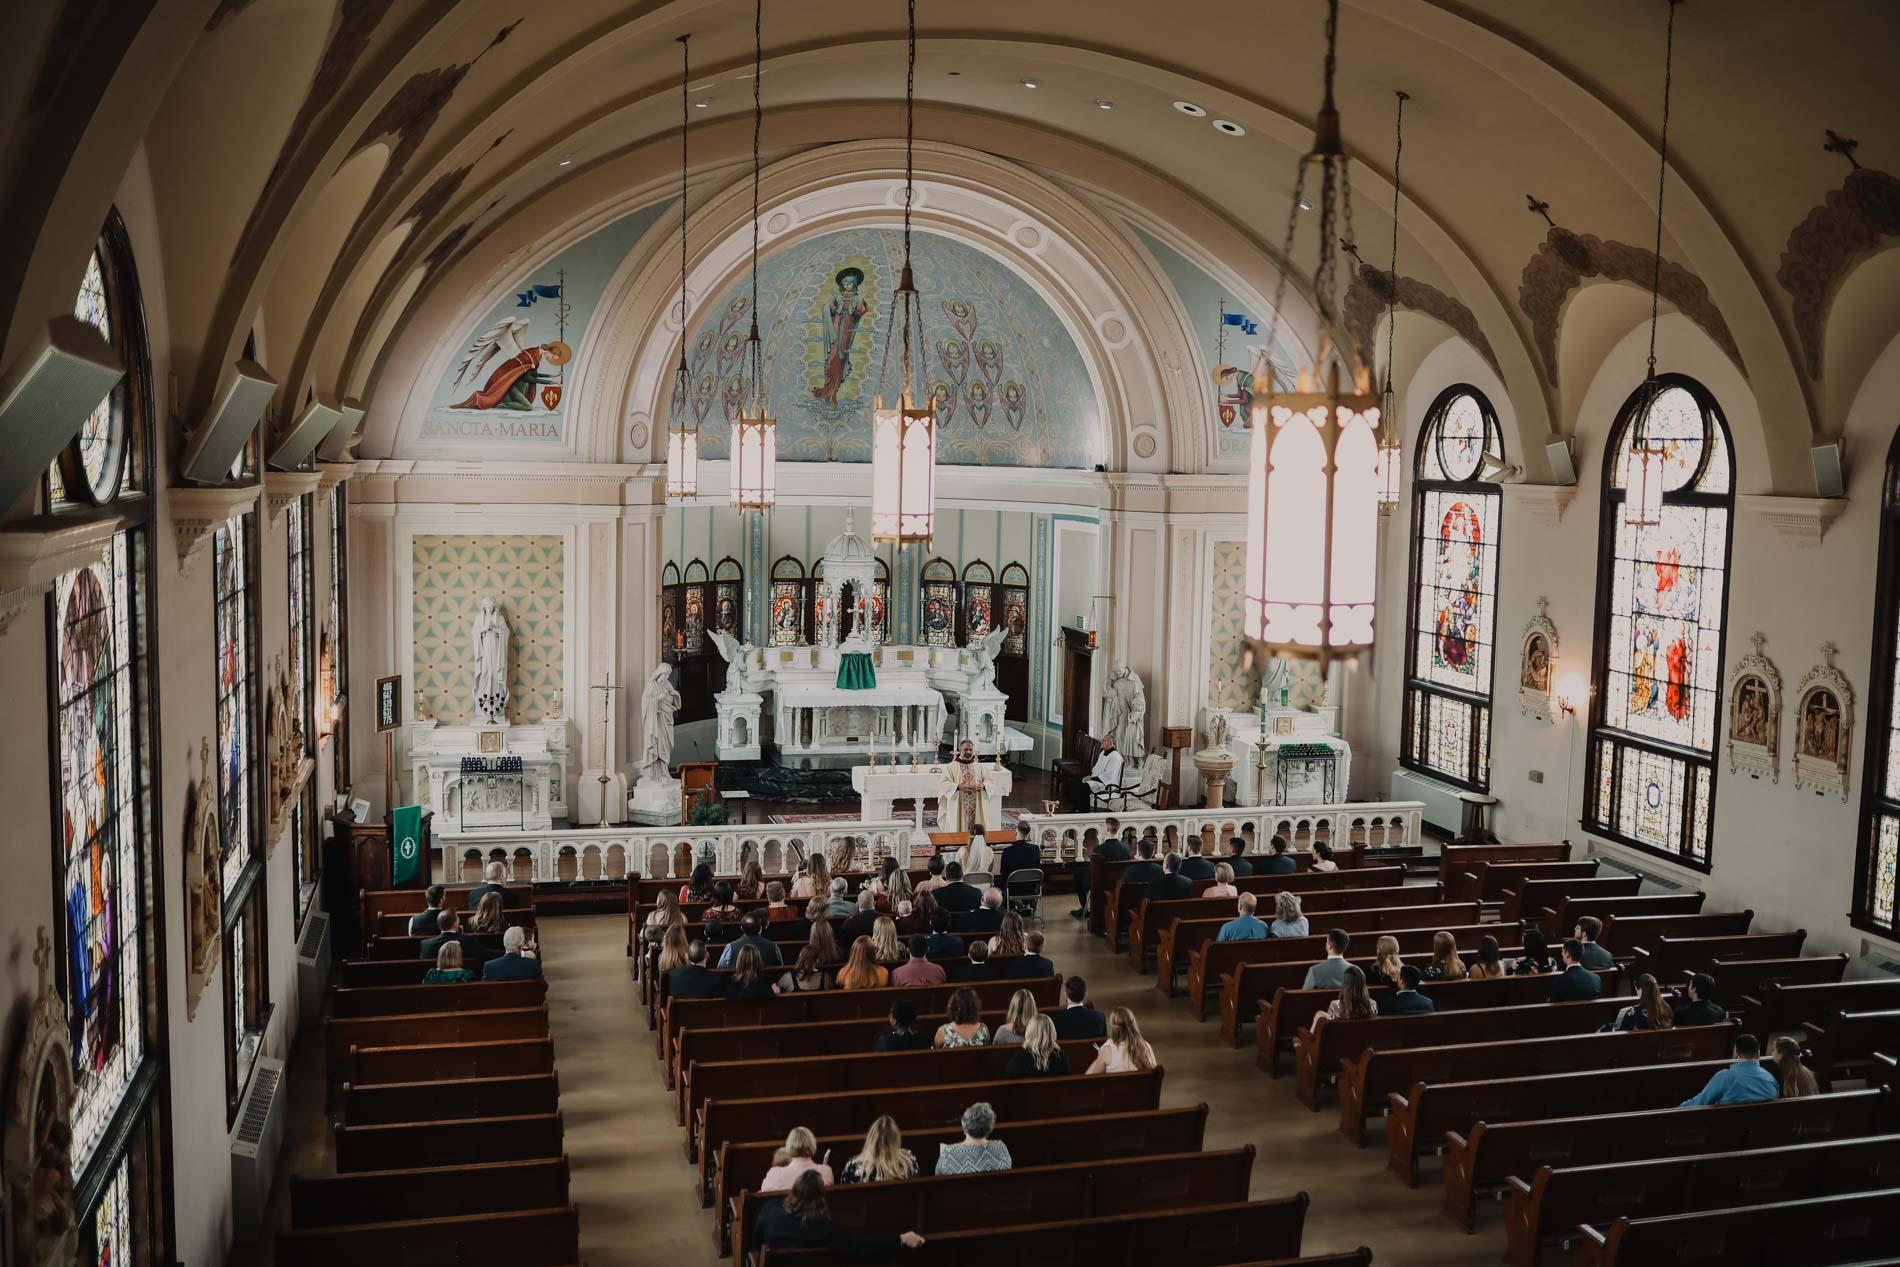 Catholic Church ceremony space